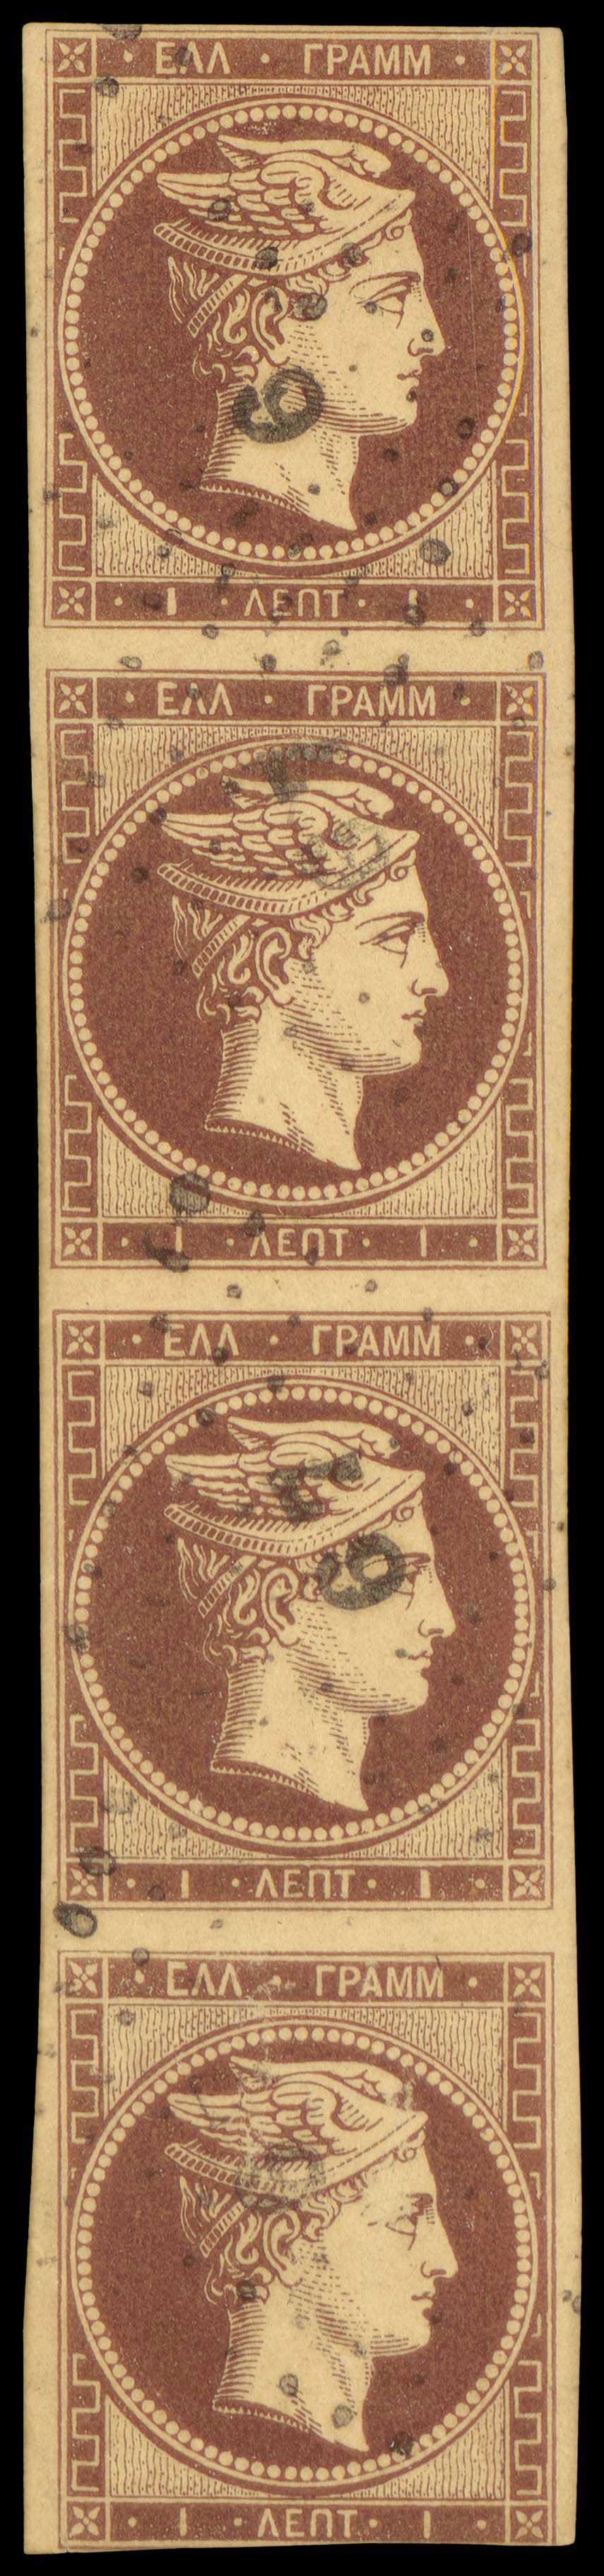 Lot 15 - GREECE-  LARGE HERMES HEAD 1861 paris print -  A. Karamitsos Public & LIVE Bid Auction 600 Coins, Medals & Banknotes